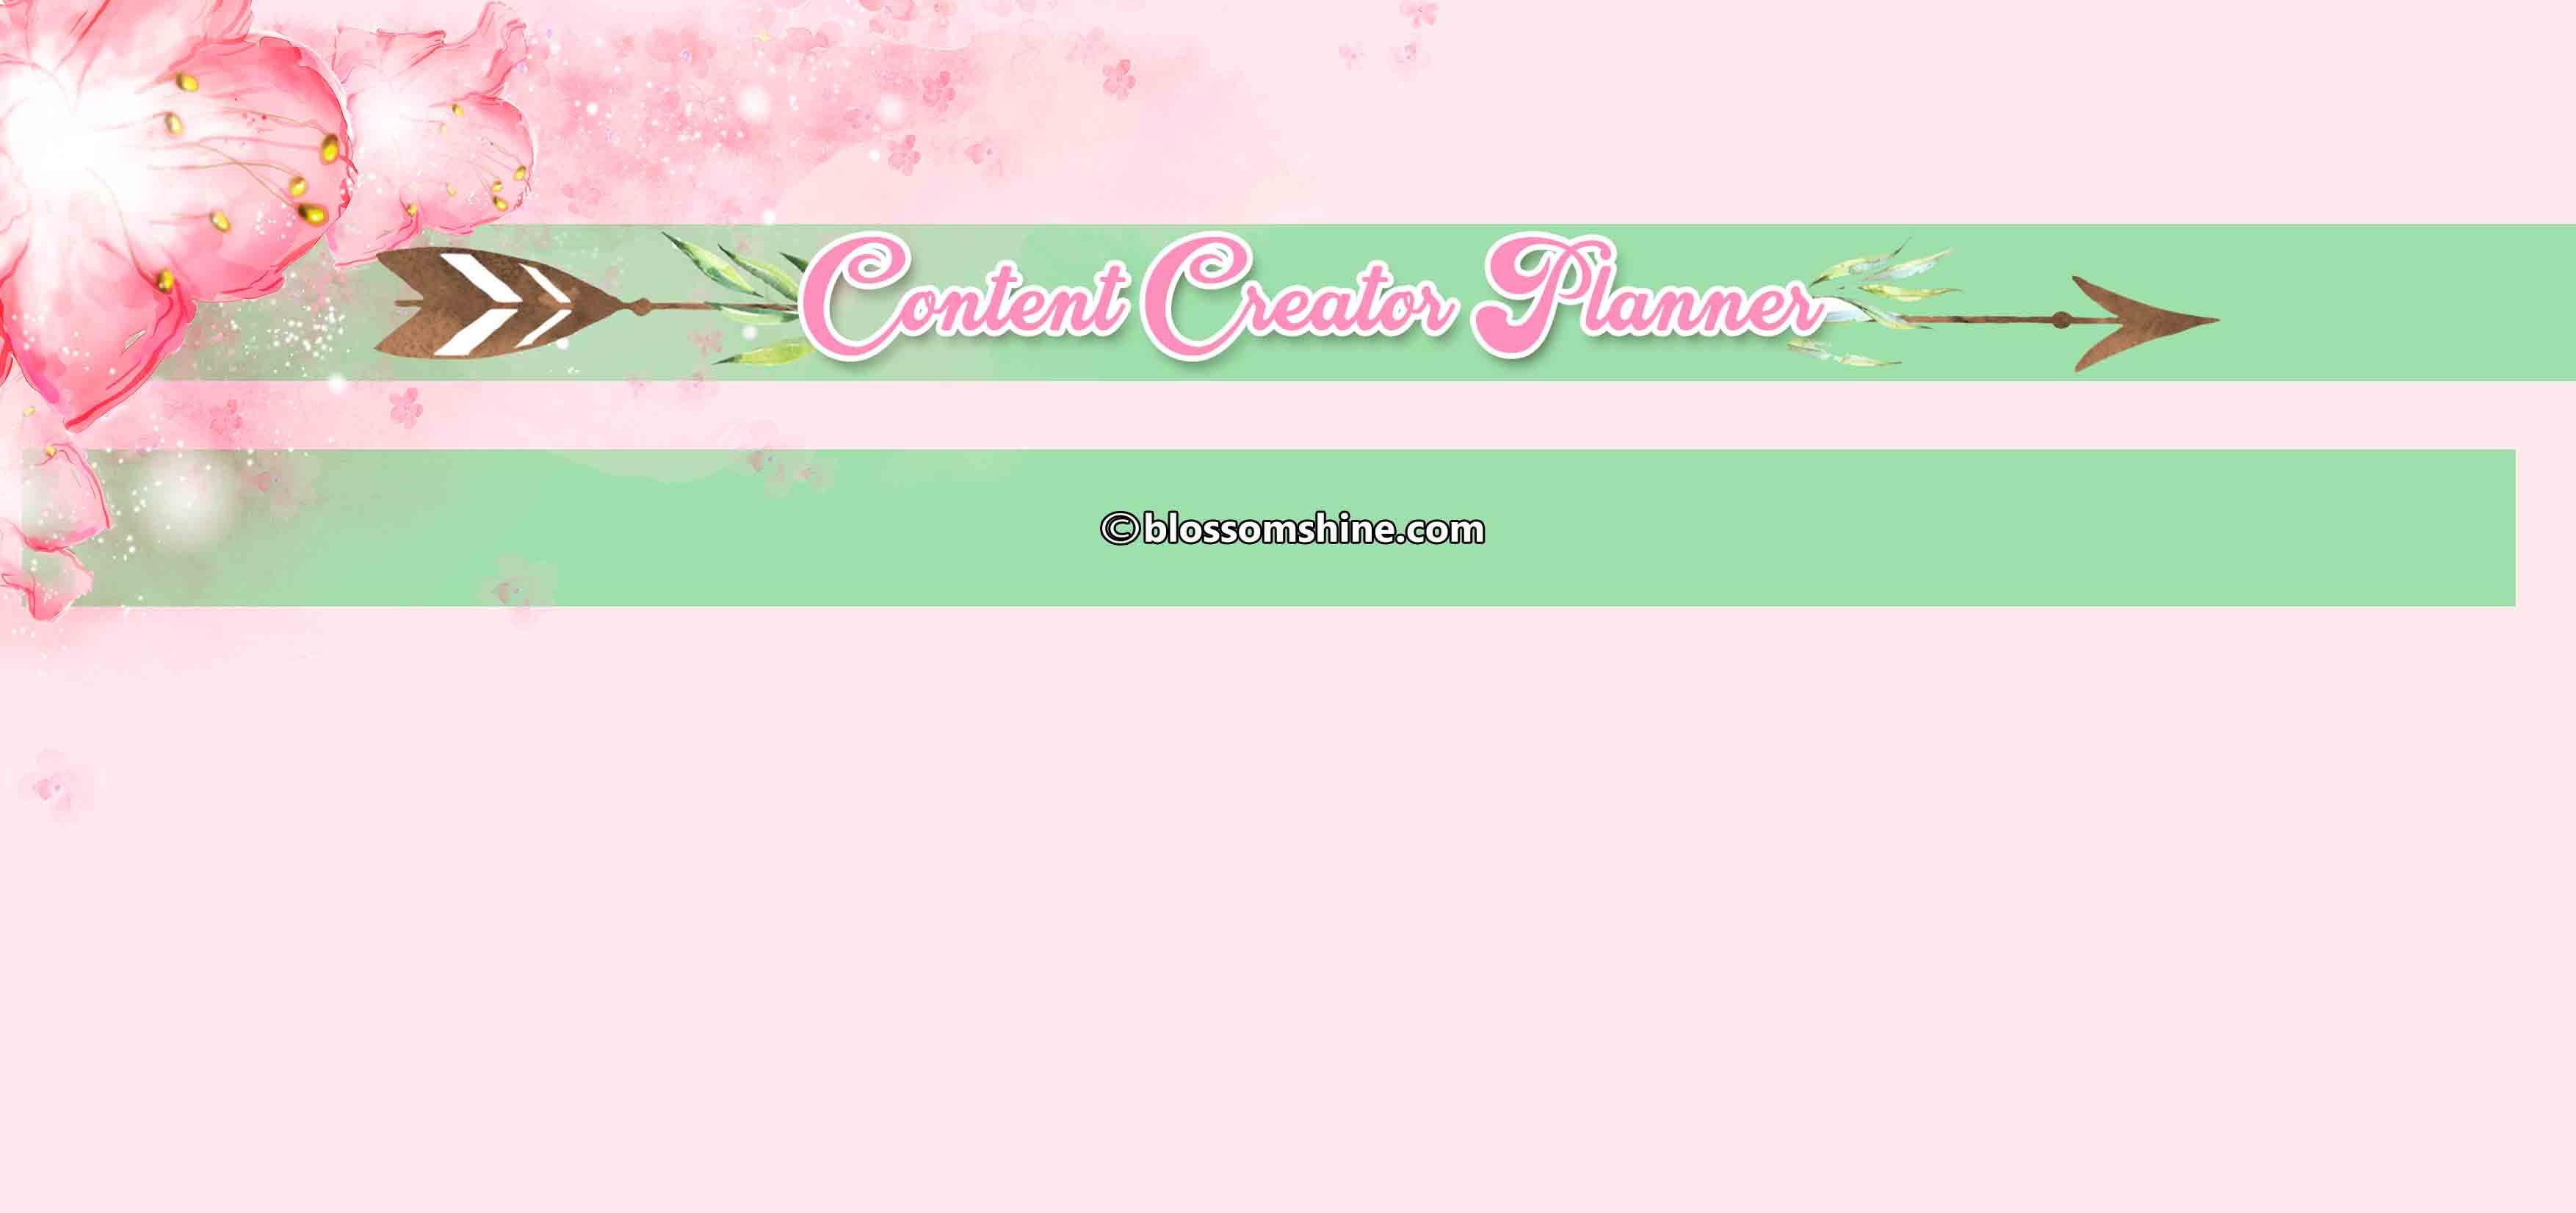 FREE Content Creator Planner (Printable Planner)